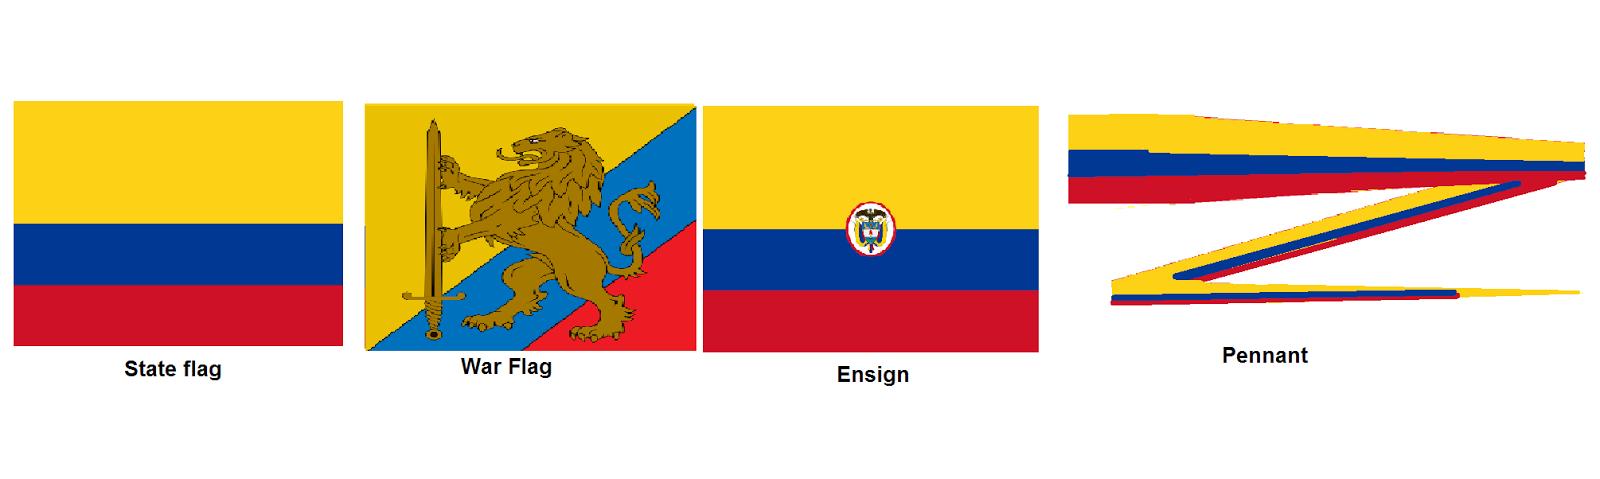 Sams Flags Empire Total War Game Flags